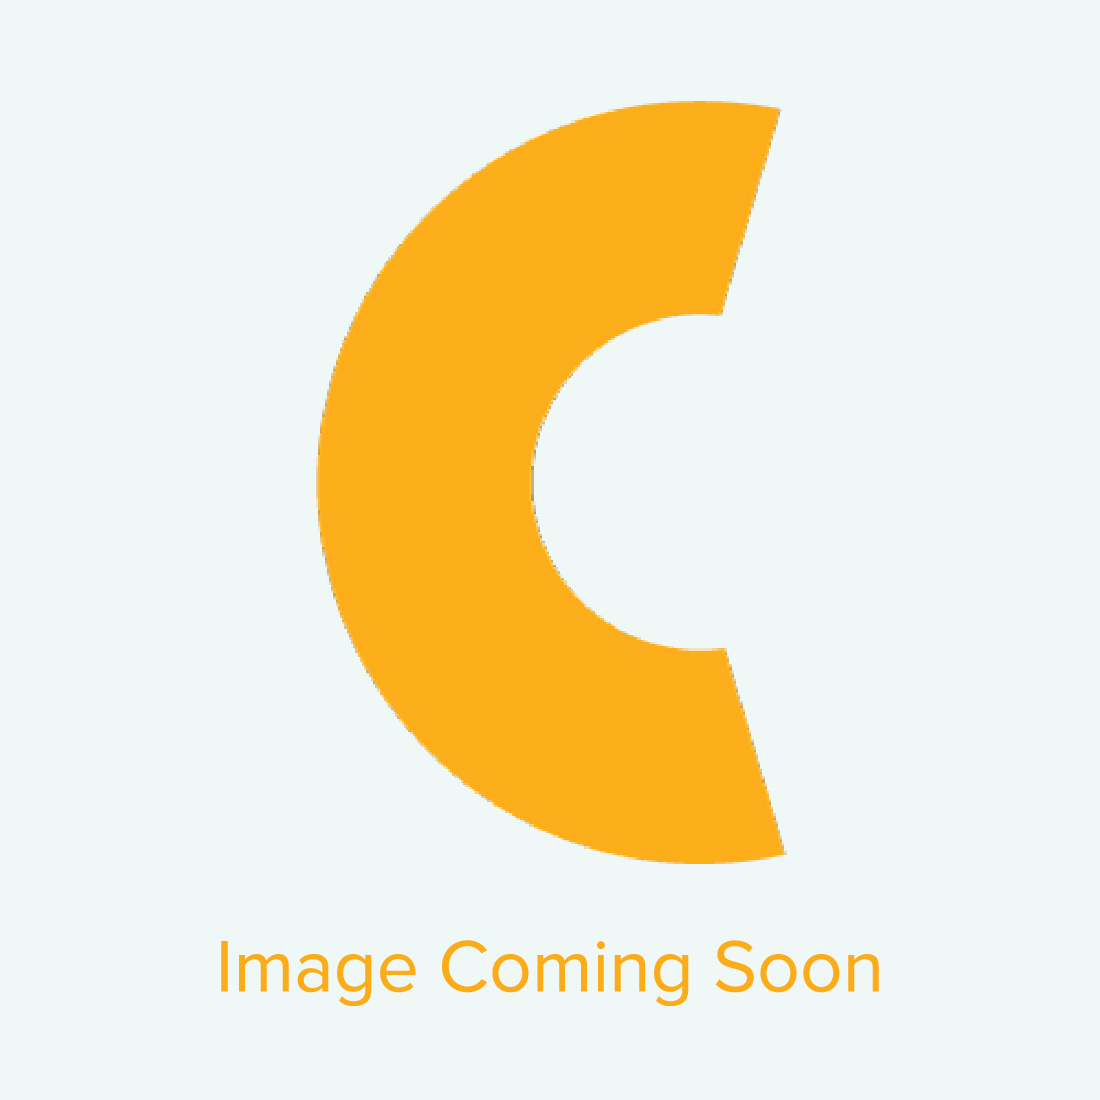 "MDF Hardboard Sublimation Plaque with Black Edge - 11.625"" x 16"""